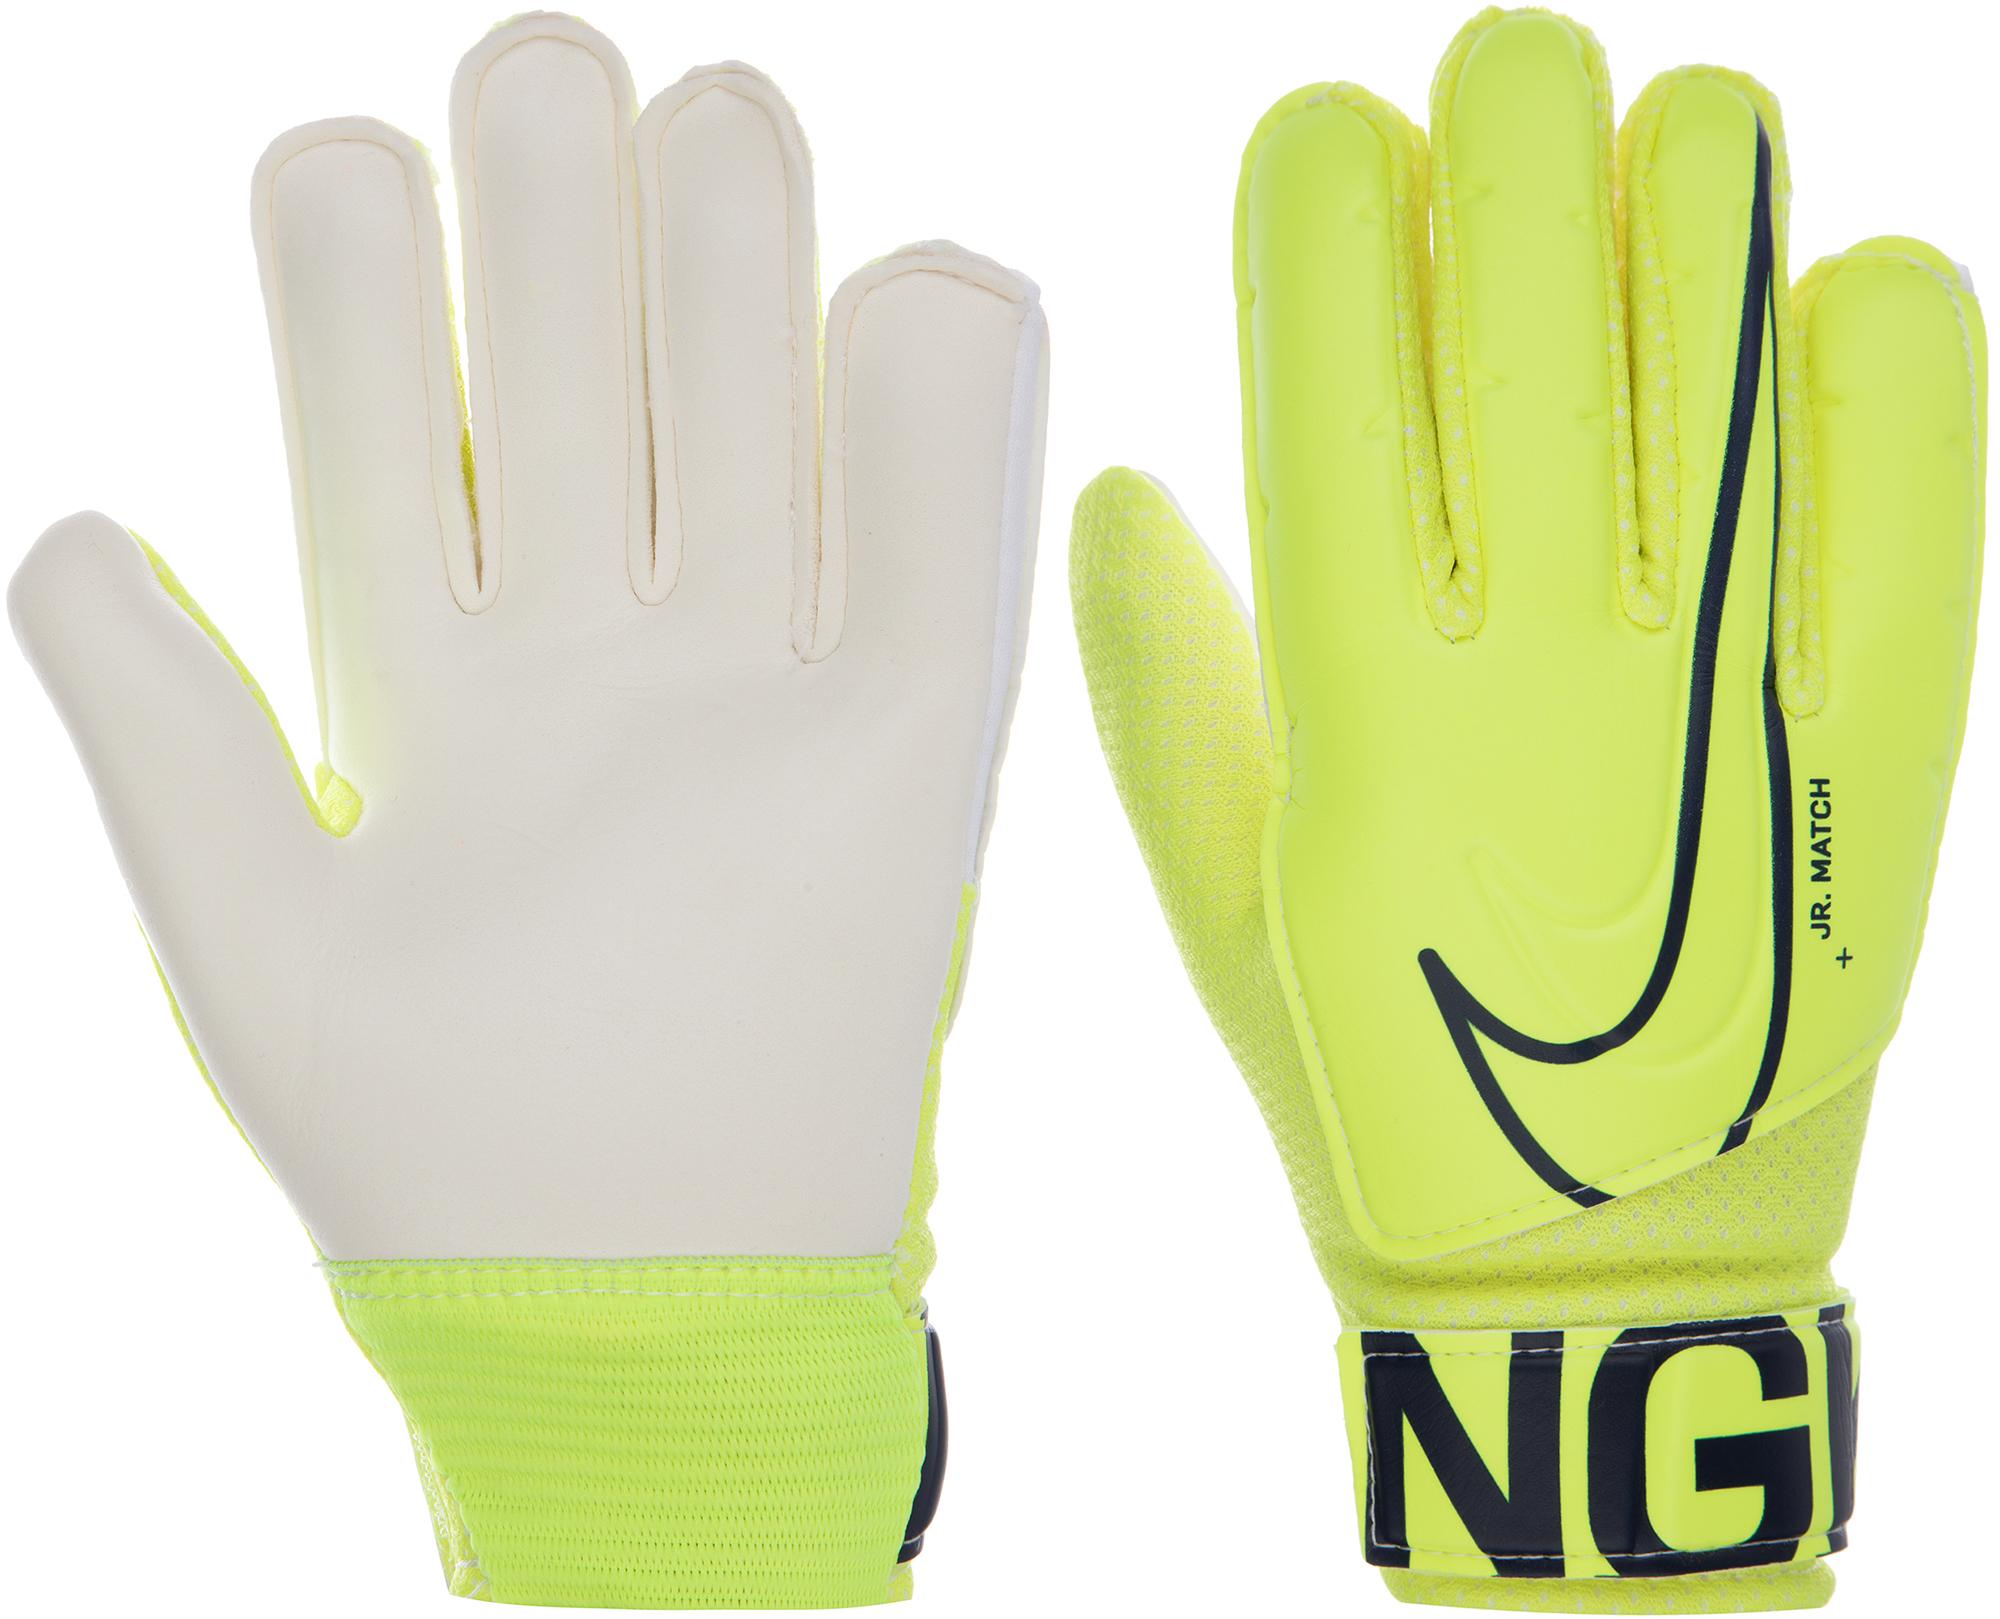 Nike Перчатки вратарские детские Nike, размер 6 nike перчатки мужские nike размер l